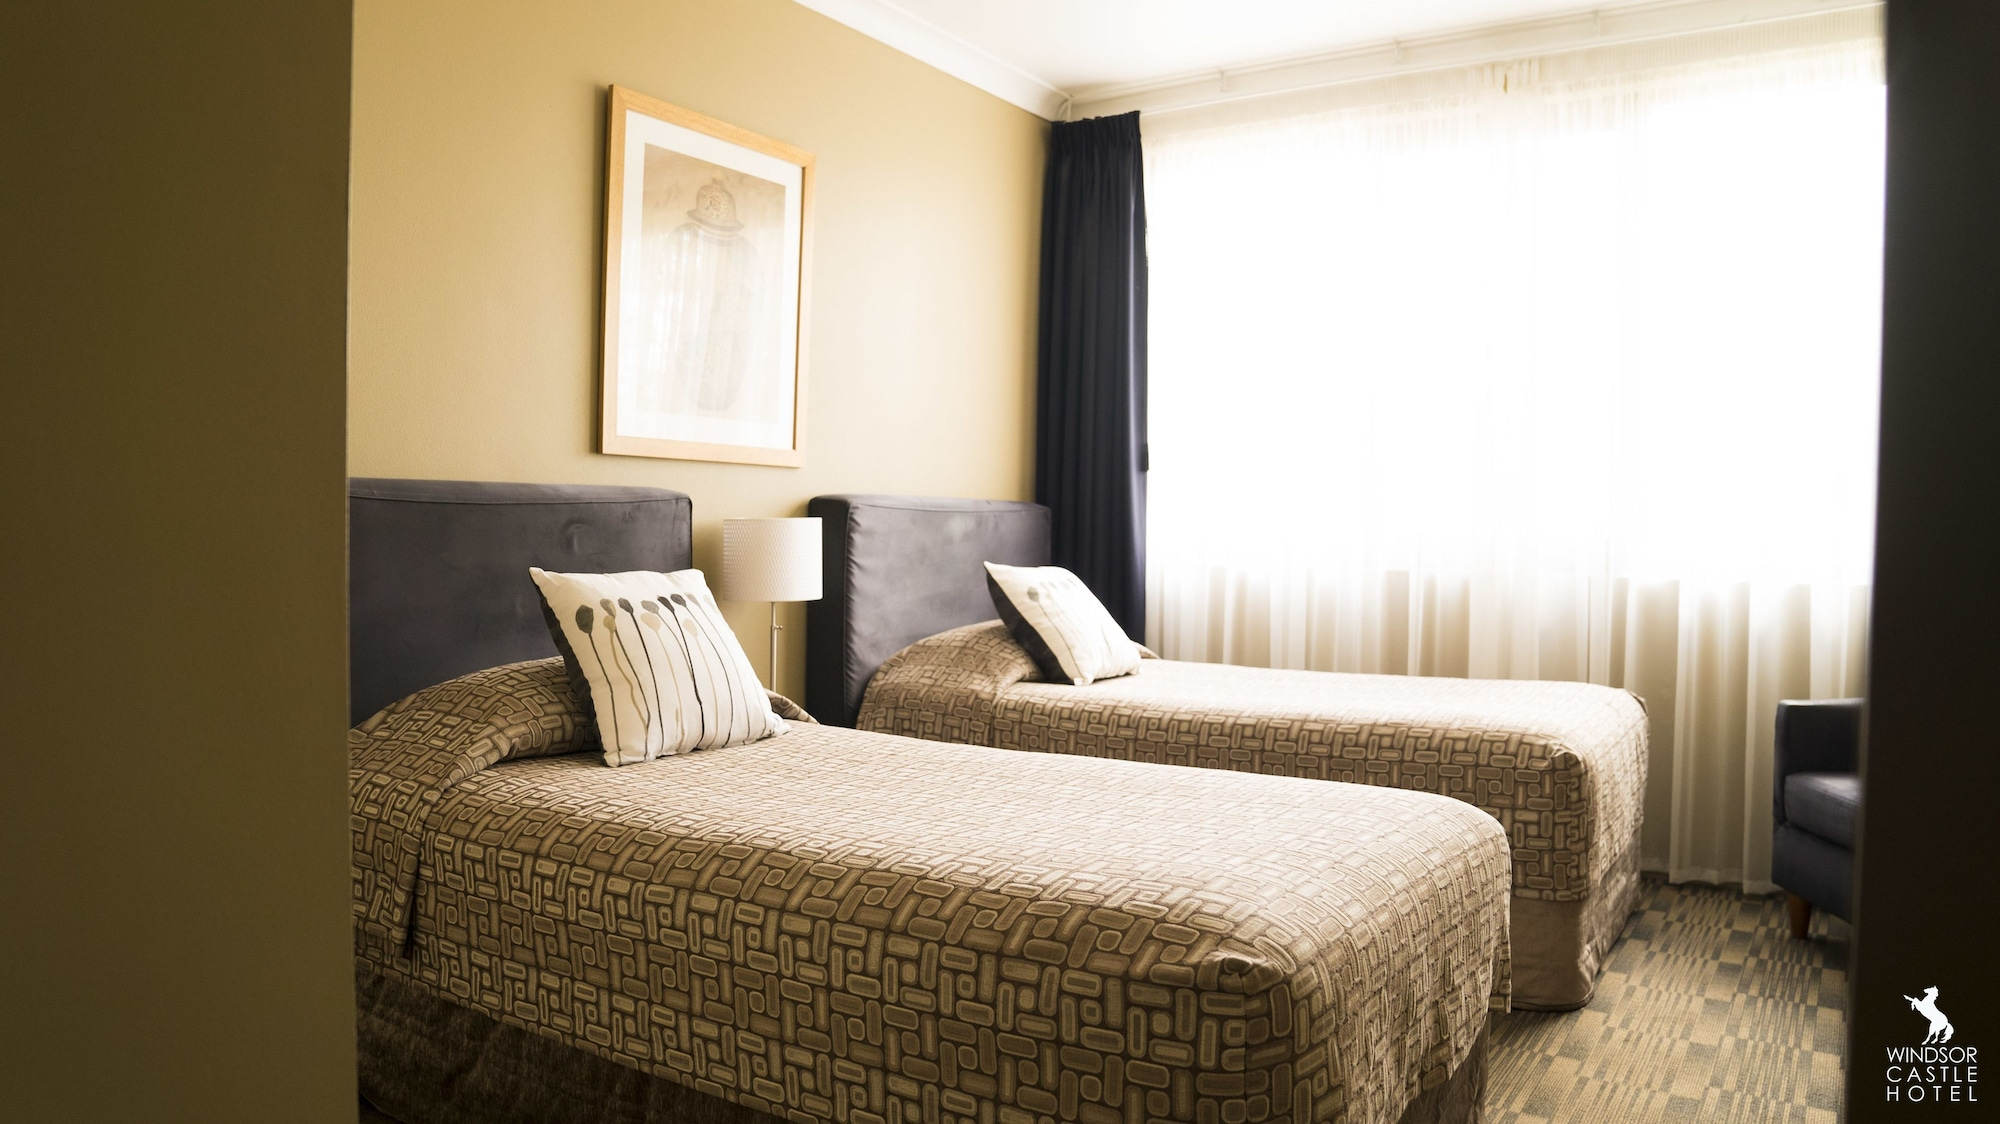 The Windsor Castle Hotel, Maitland